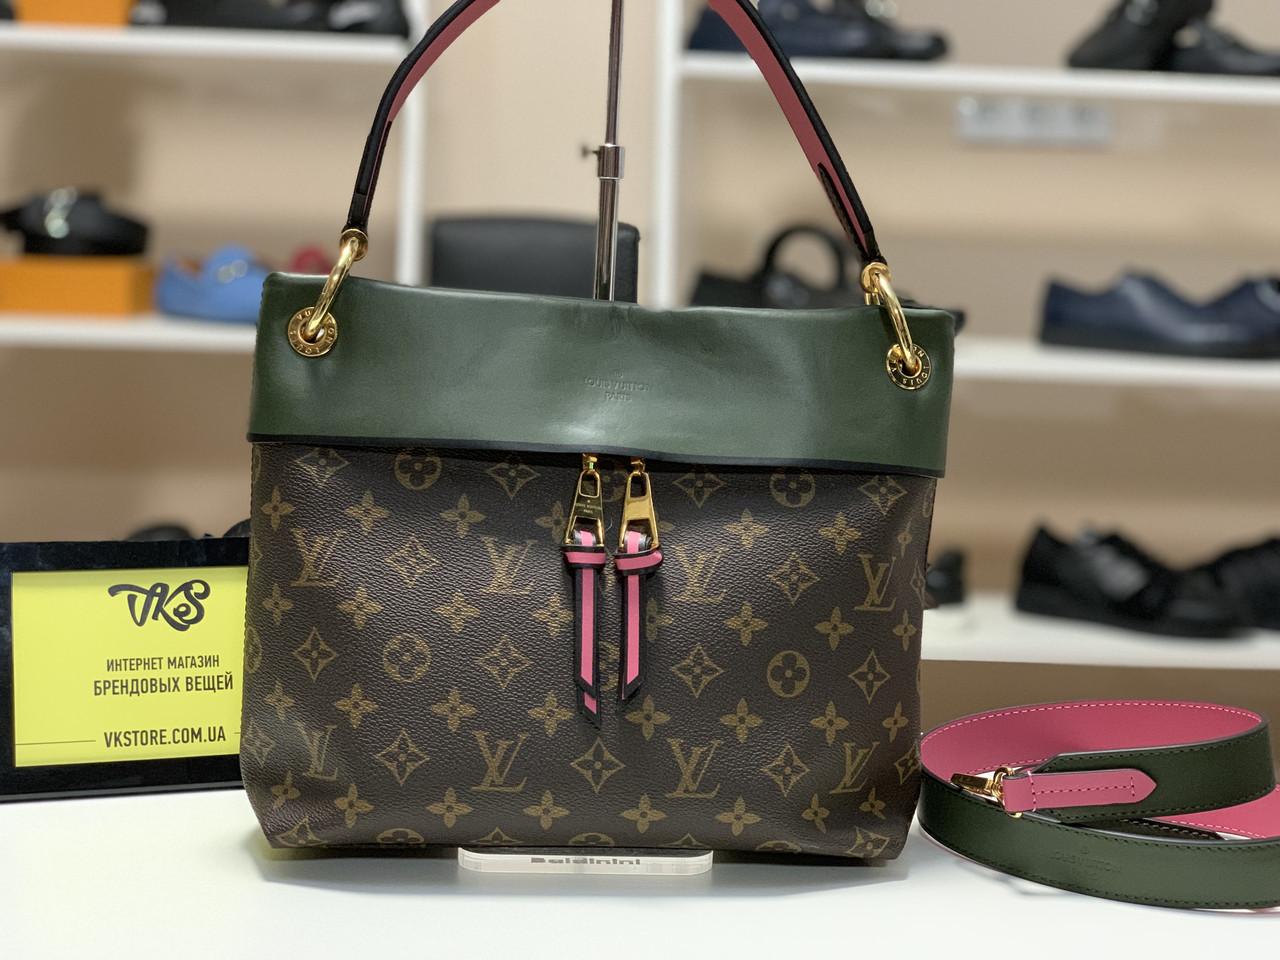 1c5e52ba7761 Женская сумка Louis Vuitton Tuileries Besace | vkstore.com.ua